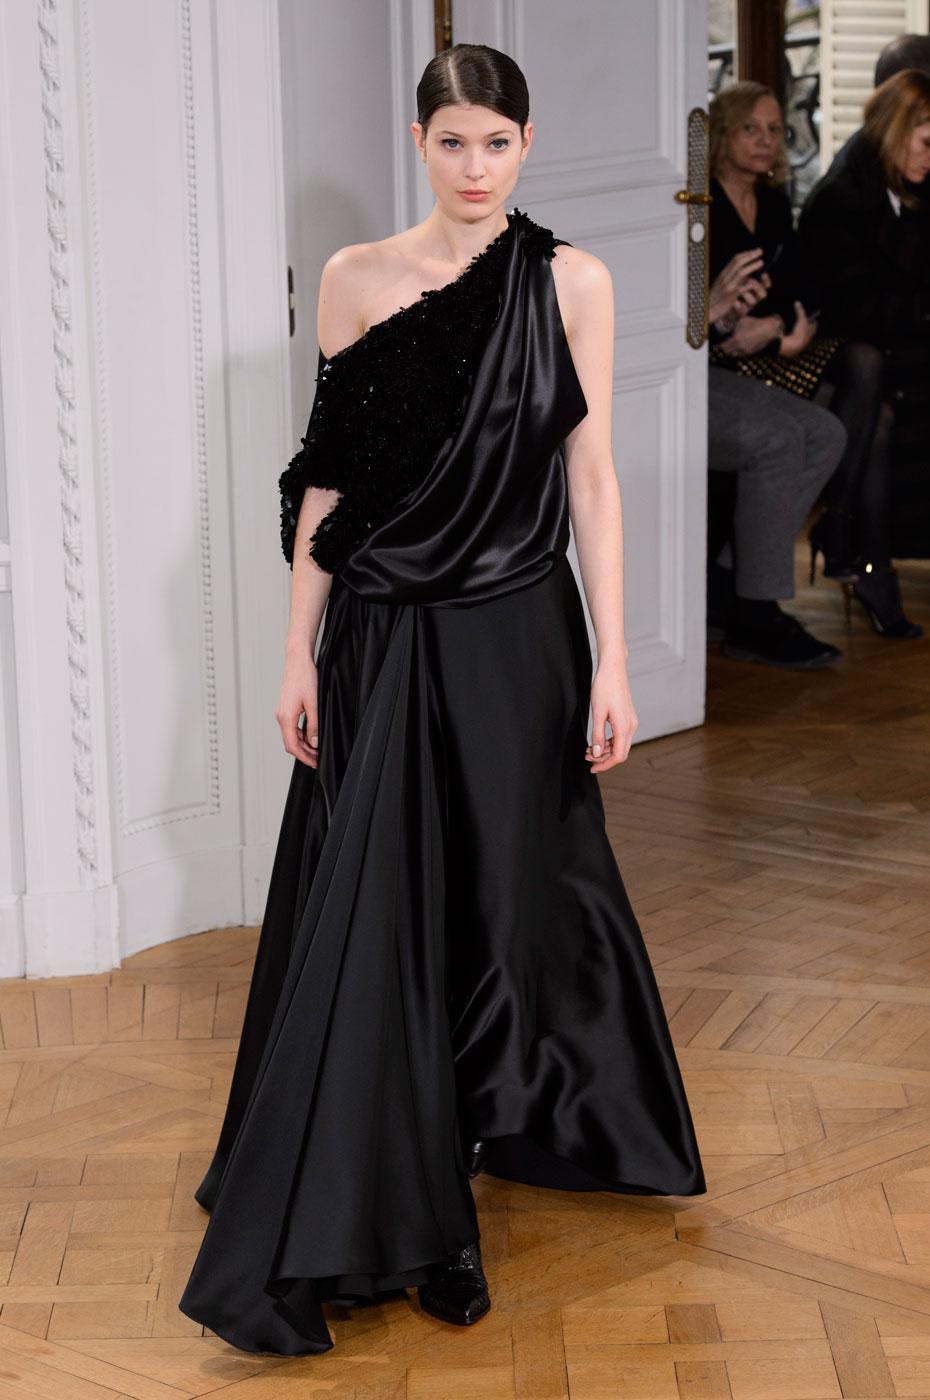 Bouchra-Jarrar-fashion-runway-show-haute-couture-paris-spring-summer-2015-the-impression-15